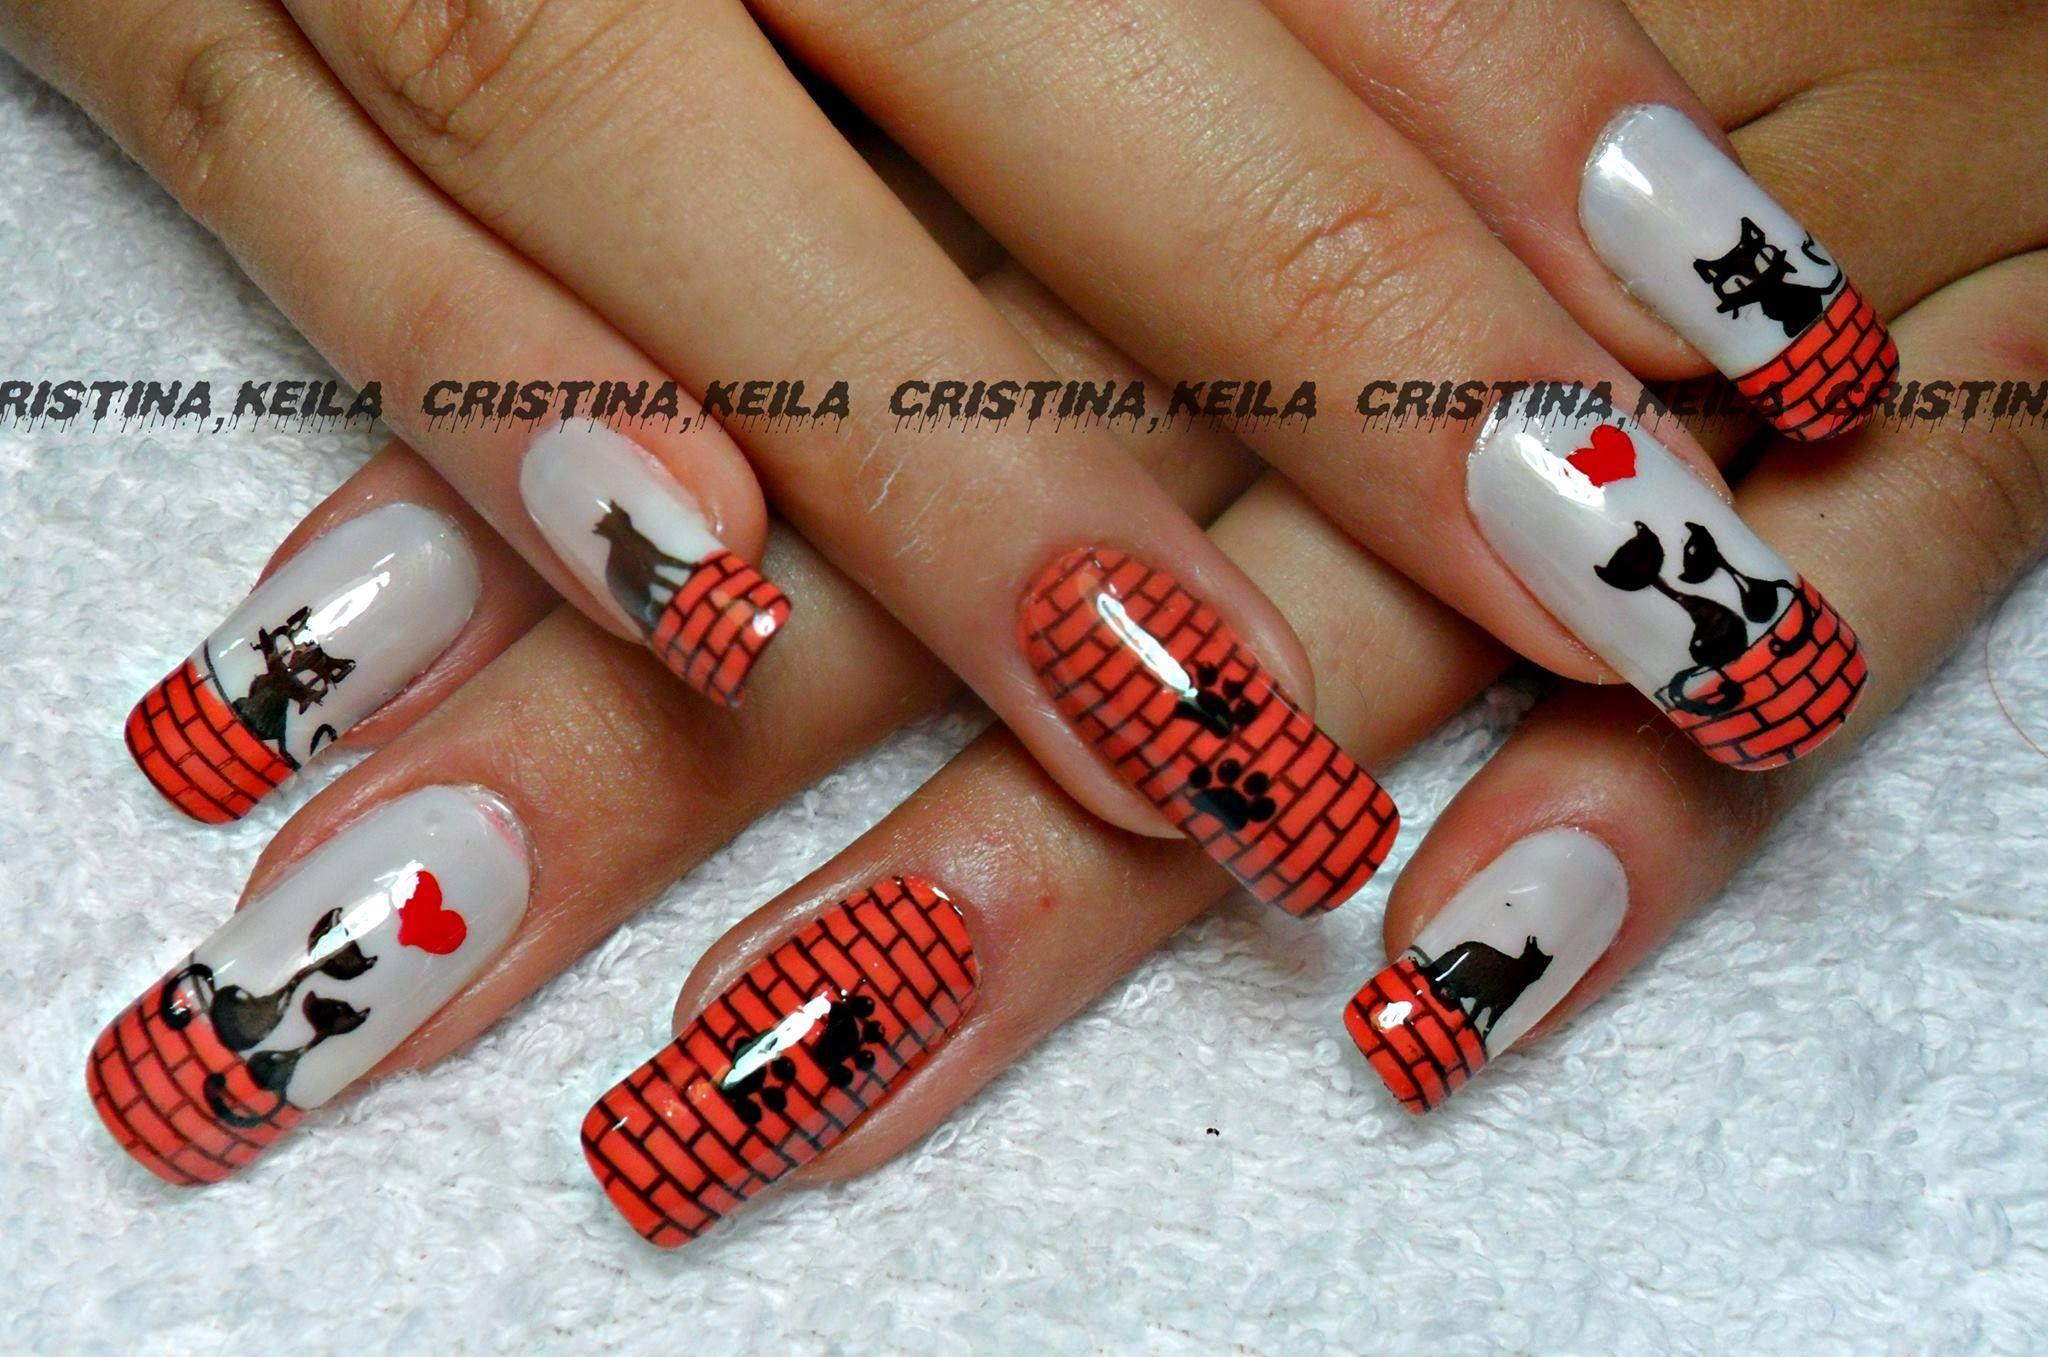 cool cats nails | Amazing Nail Designs | Pinterest | Cat nails and ...